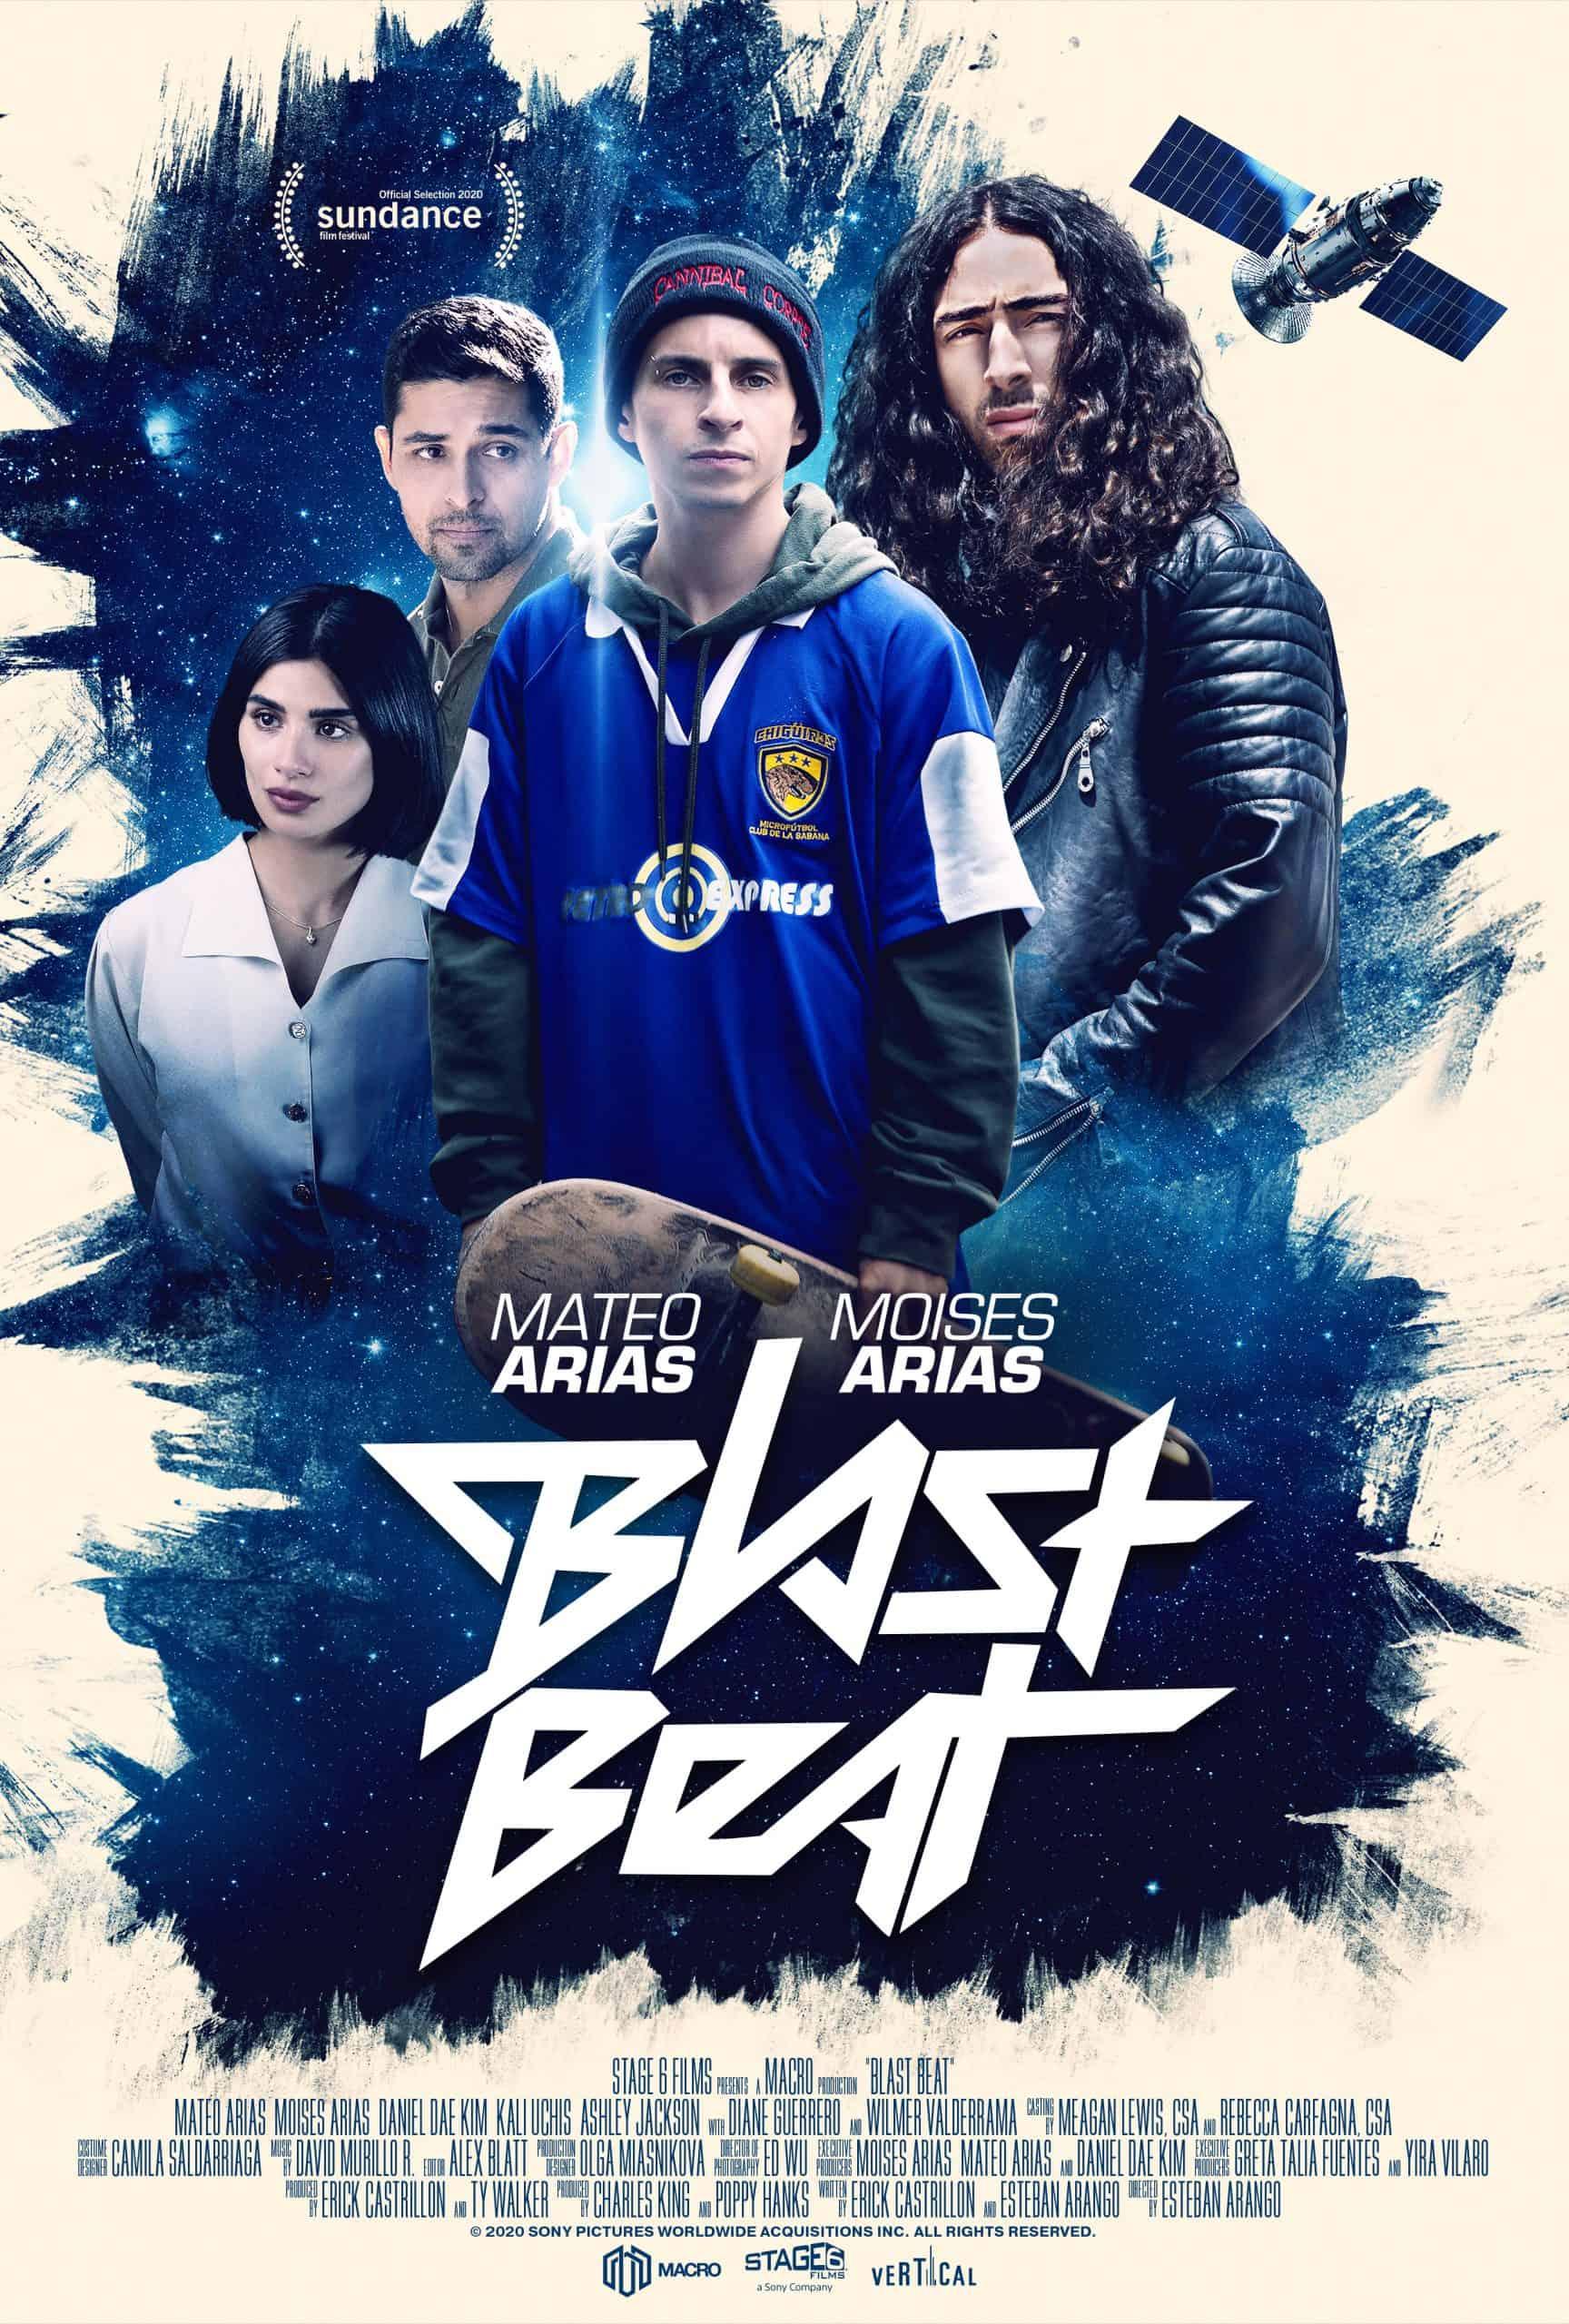 BLAST BEAT - Starring Mateo Arias, Moises Arias, Diane Guerrero, Daniel Dae Kim, Kali Uchis, Wilmer Valderrama 2